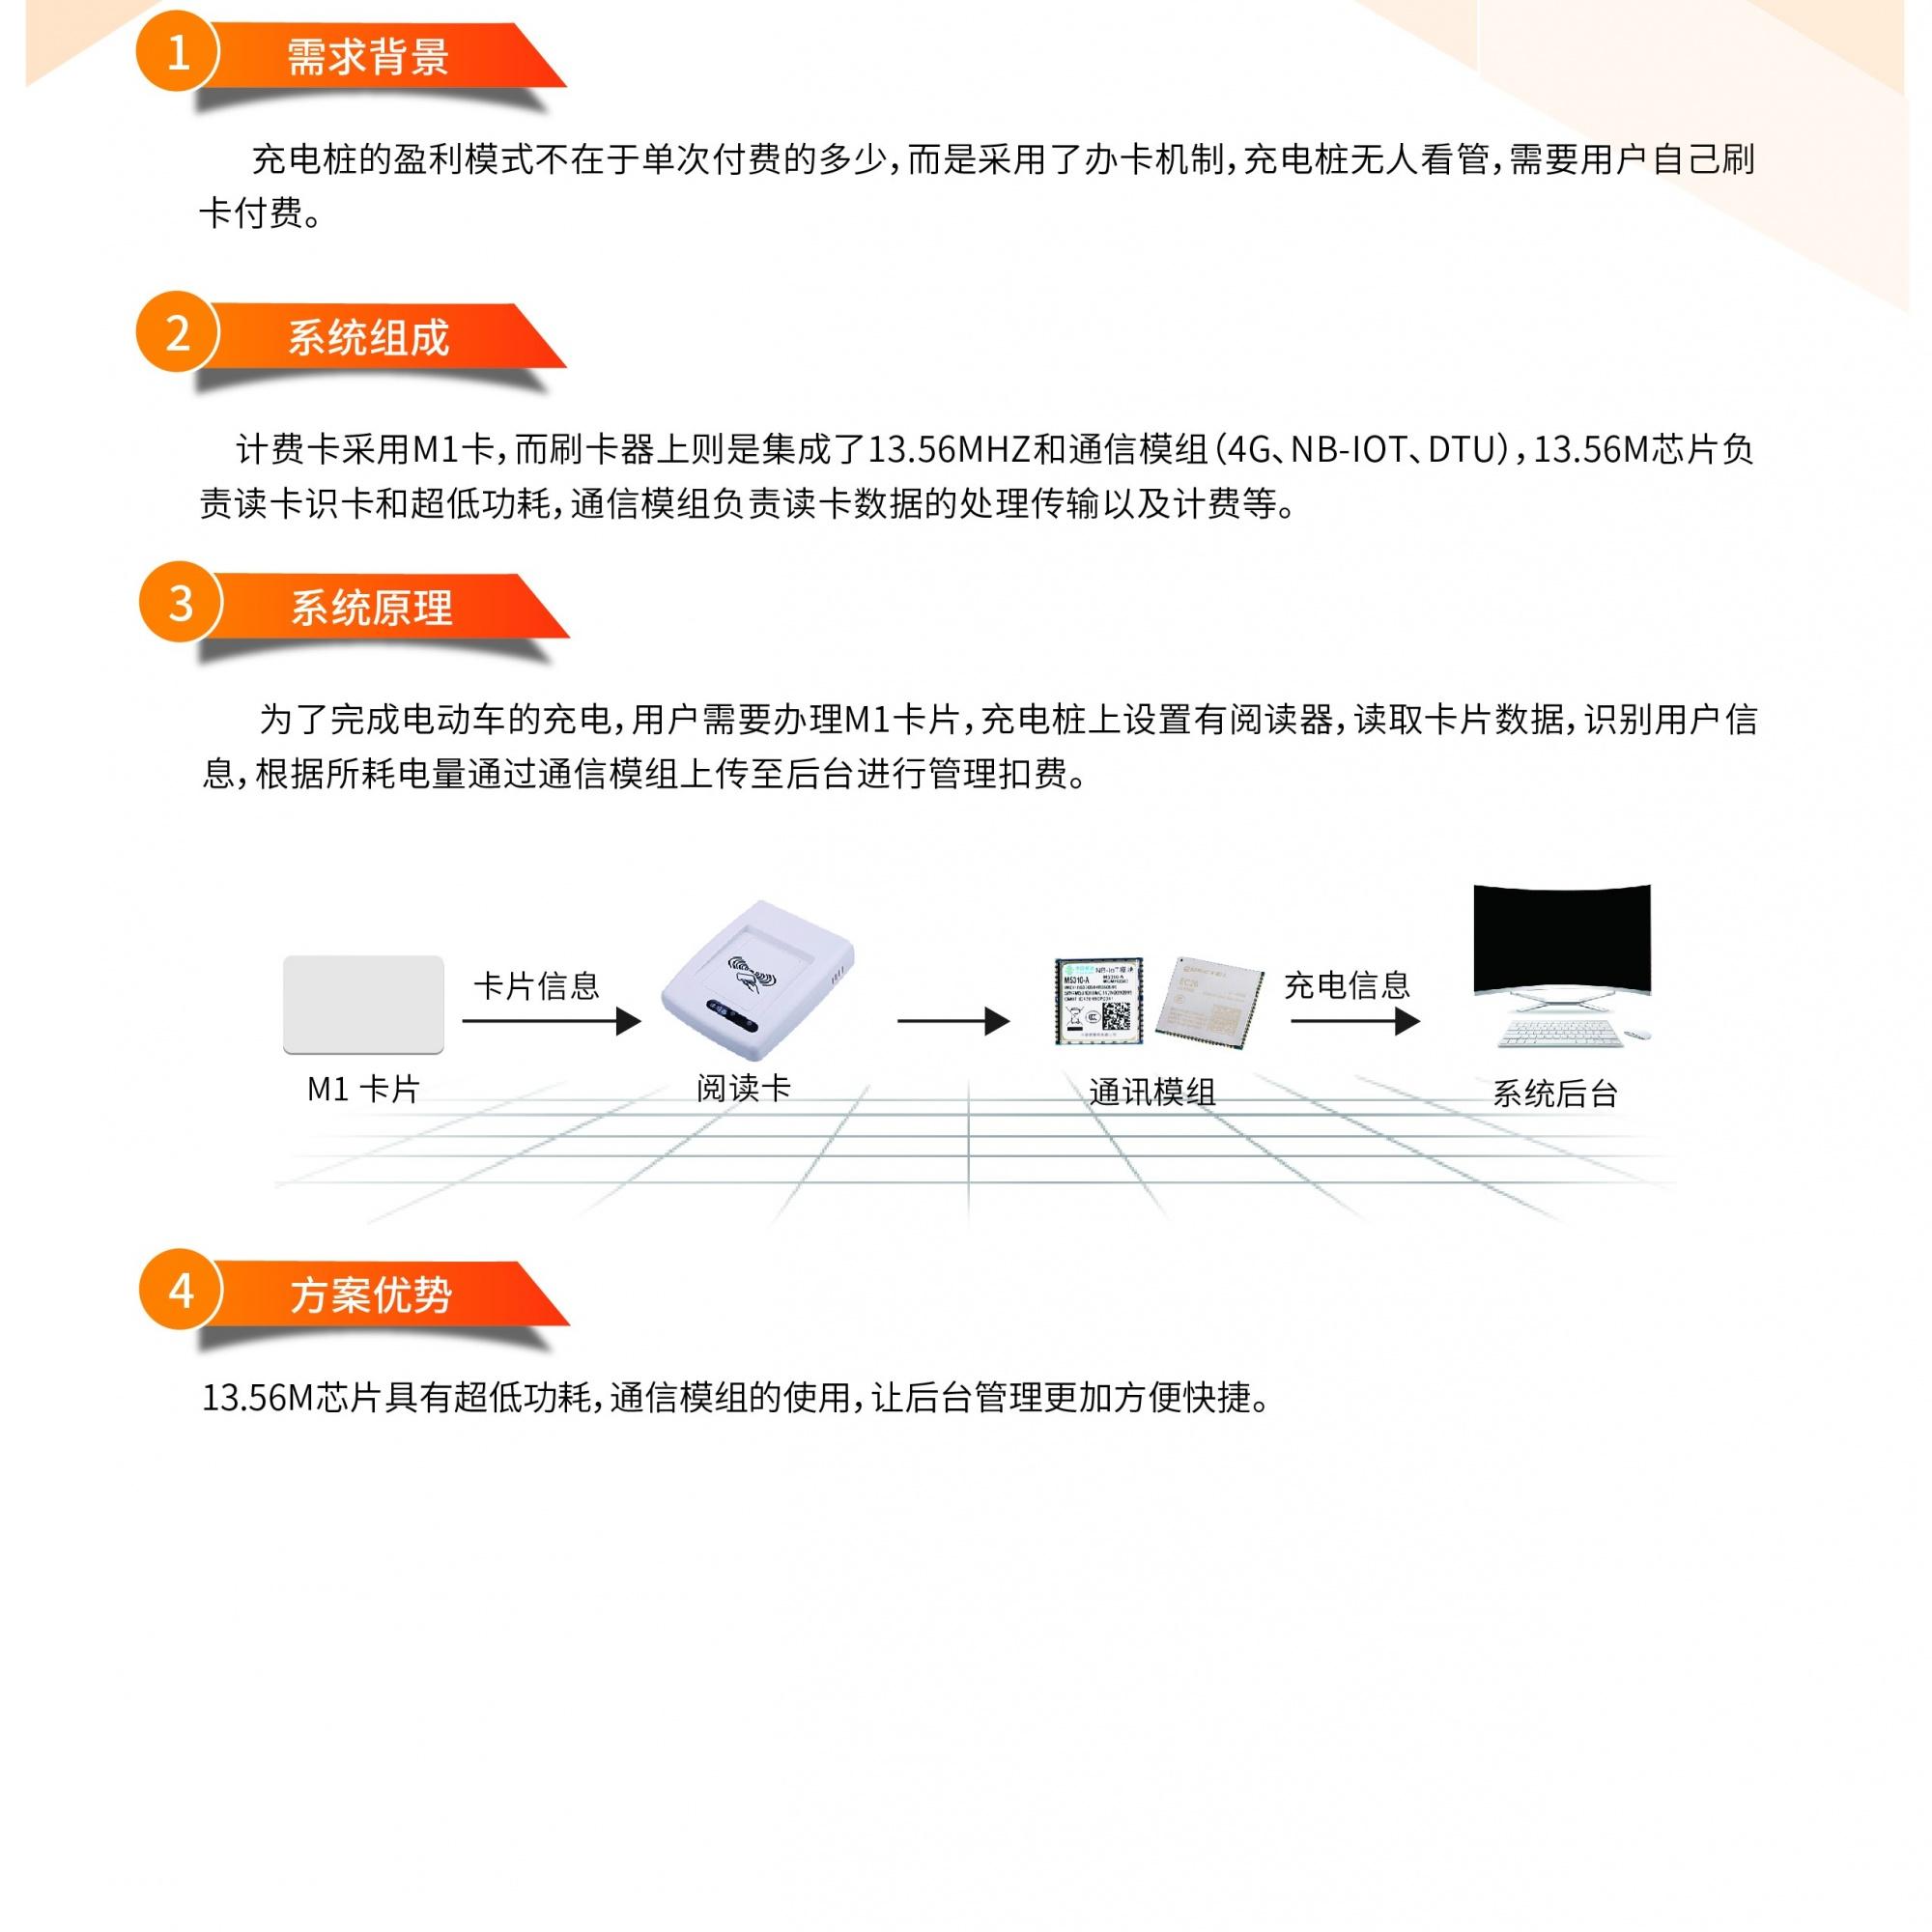 SI24R2F电动车智能充电桩温度报警项目